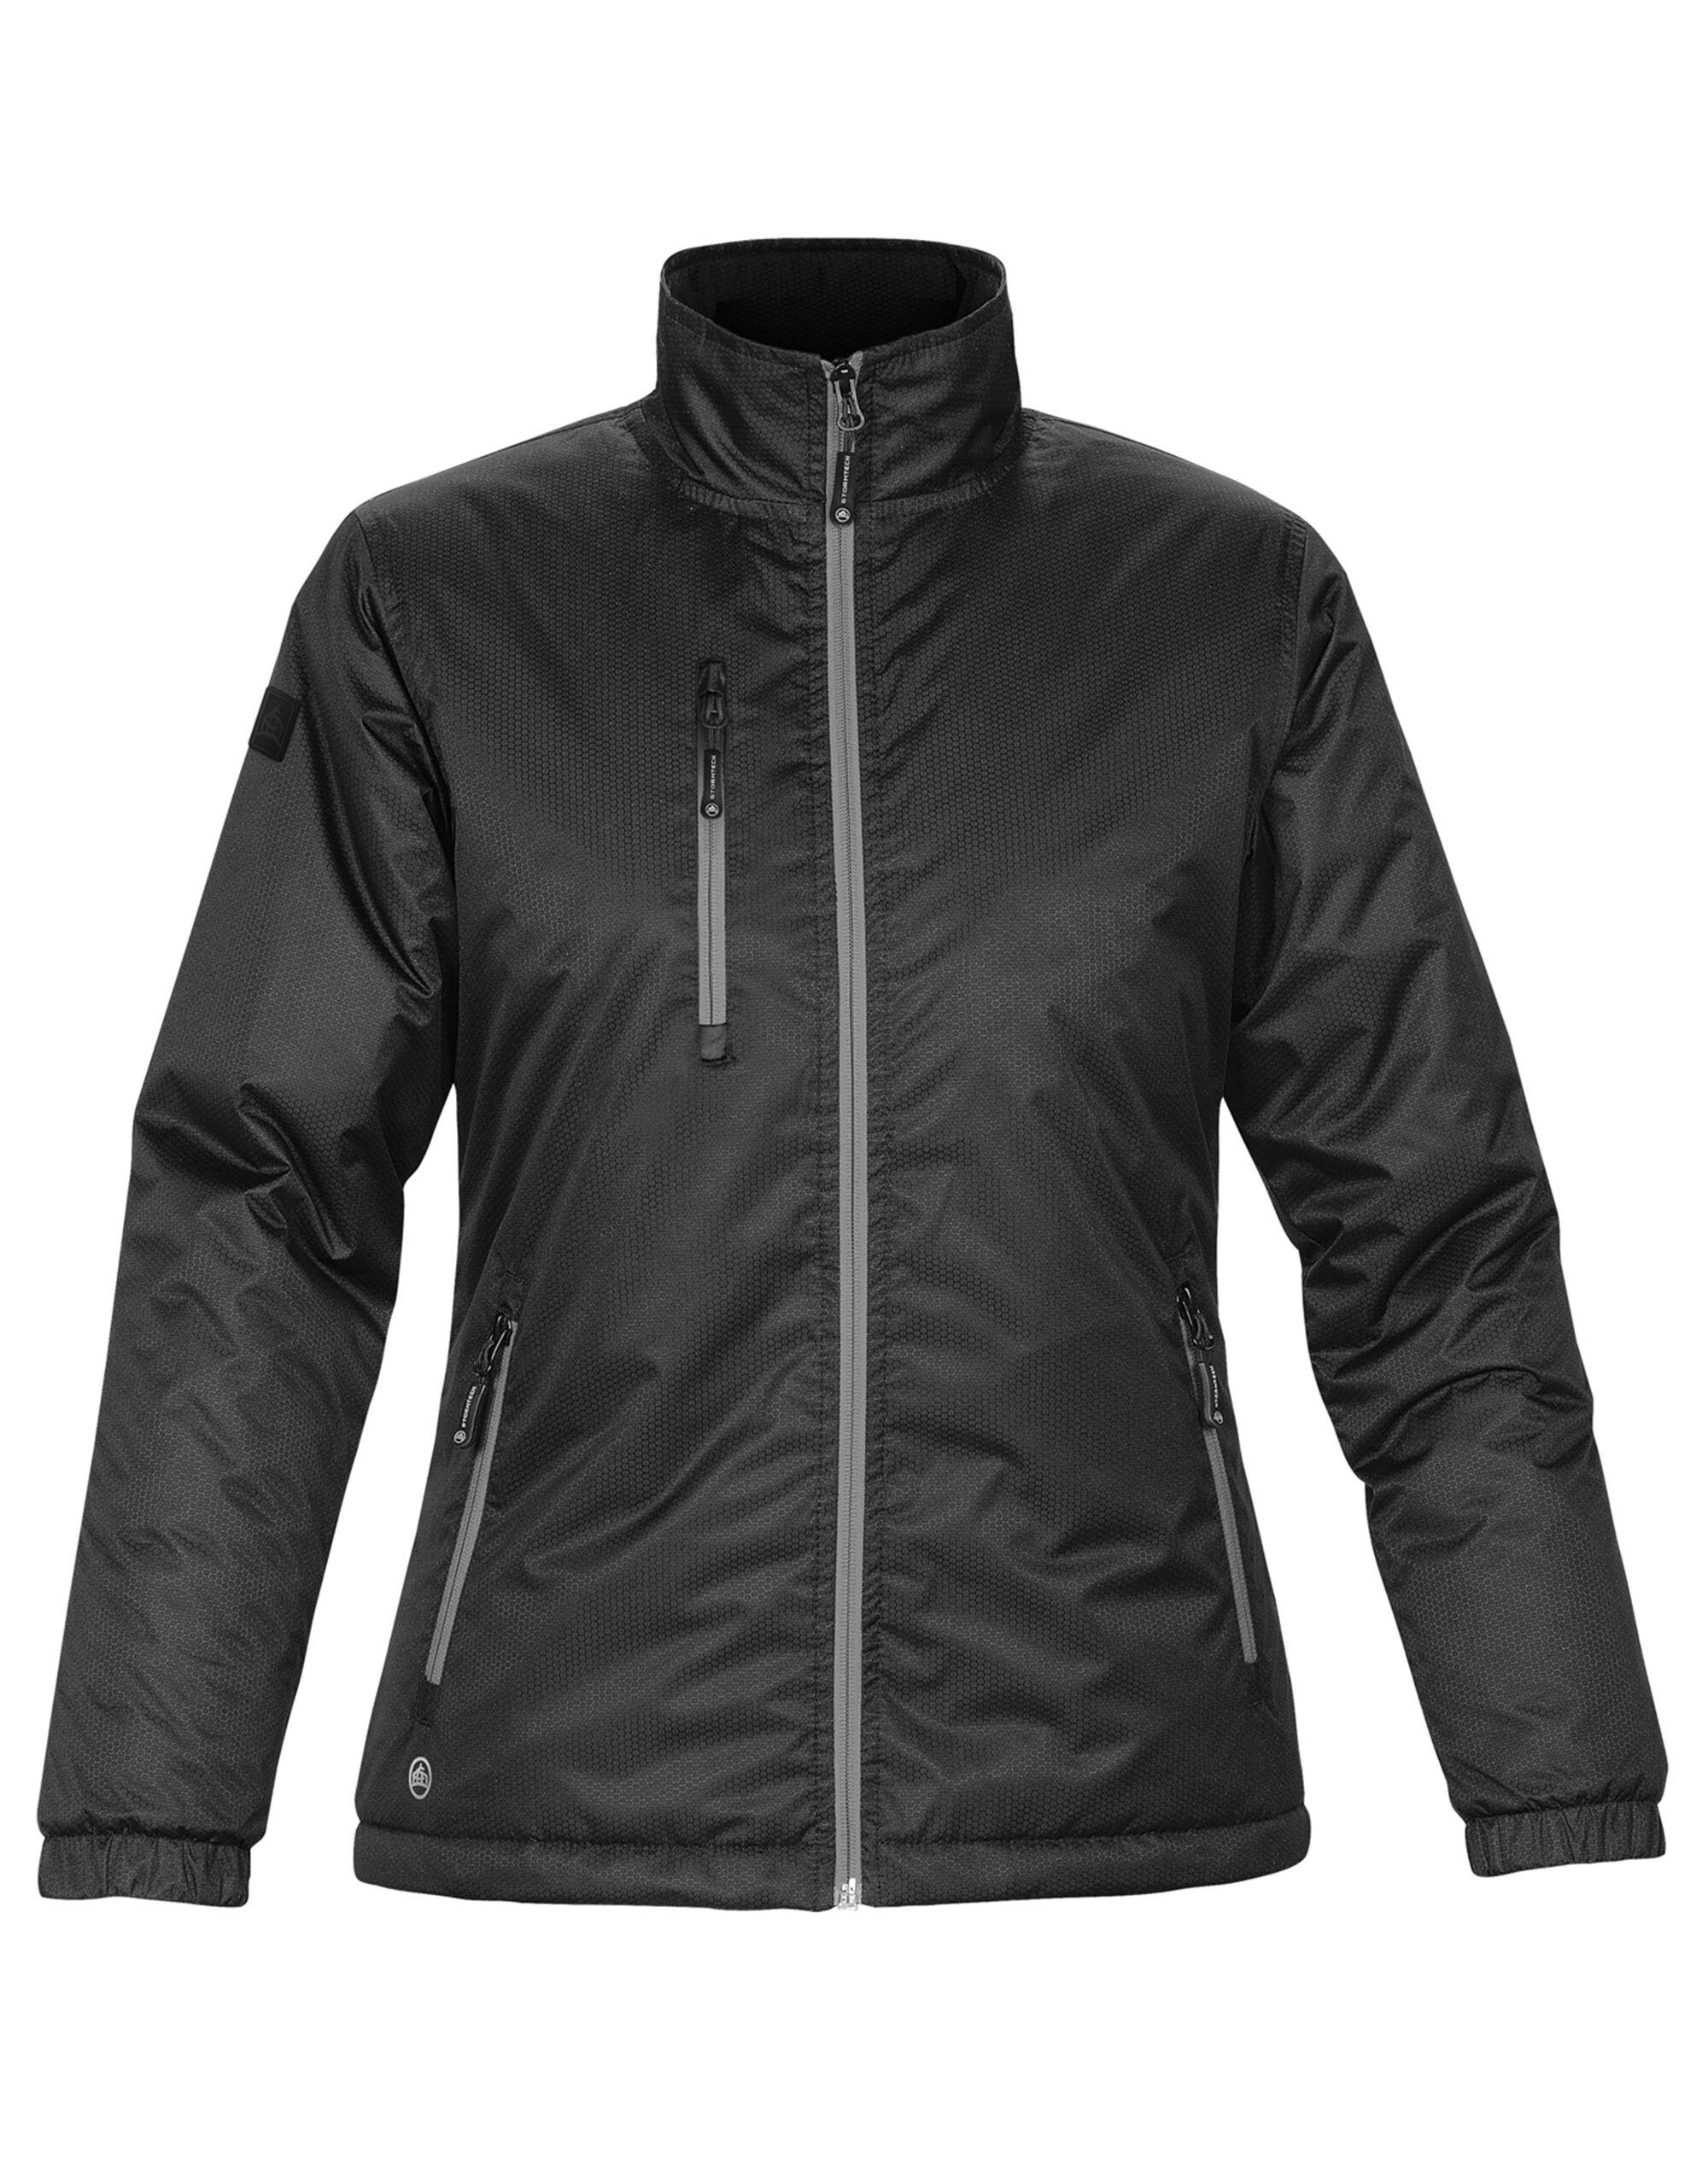 Stormtech Ladies Axis Jacket